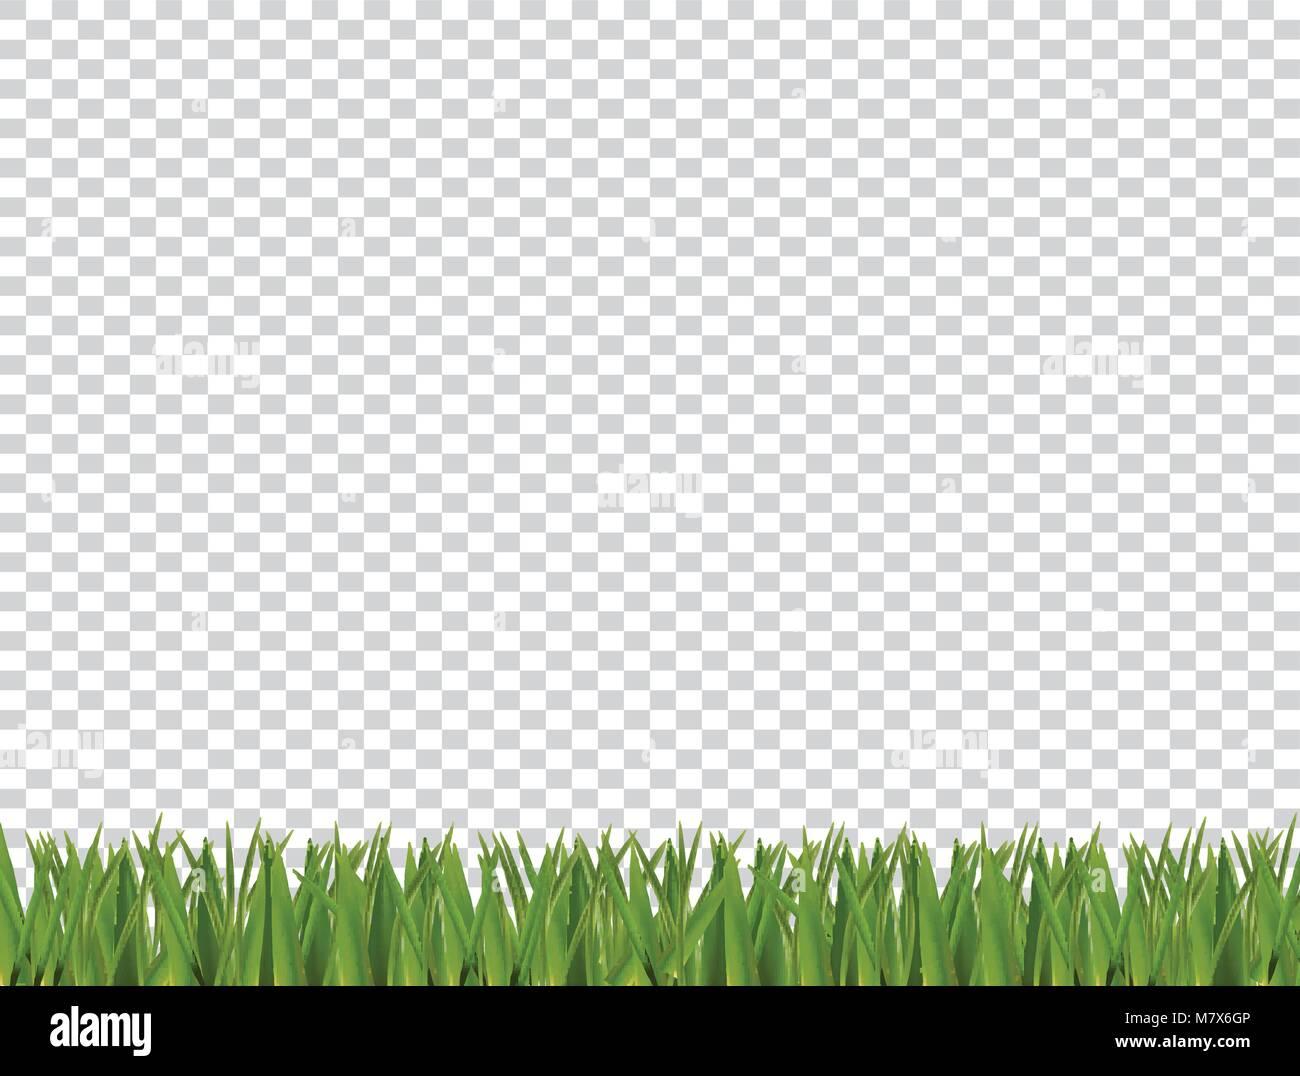 Verde césped realista borde horizontal aislado sobre fondo ...